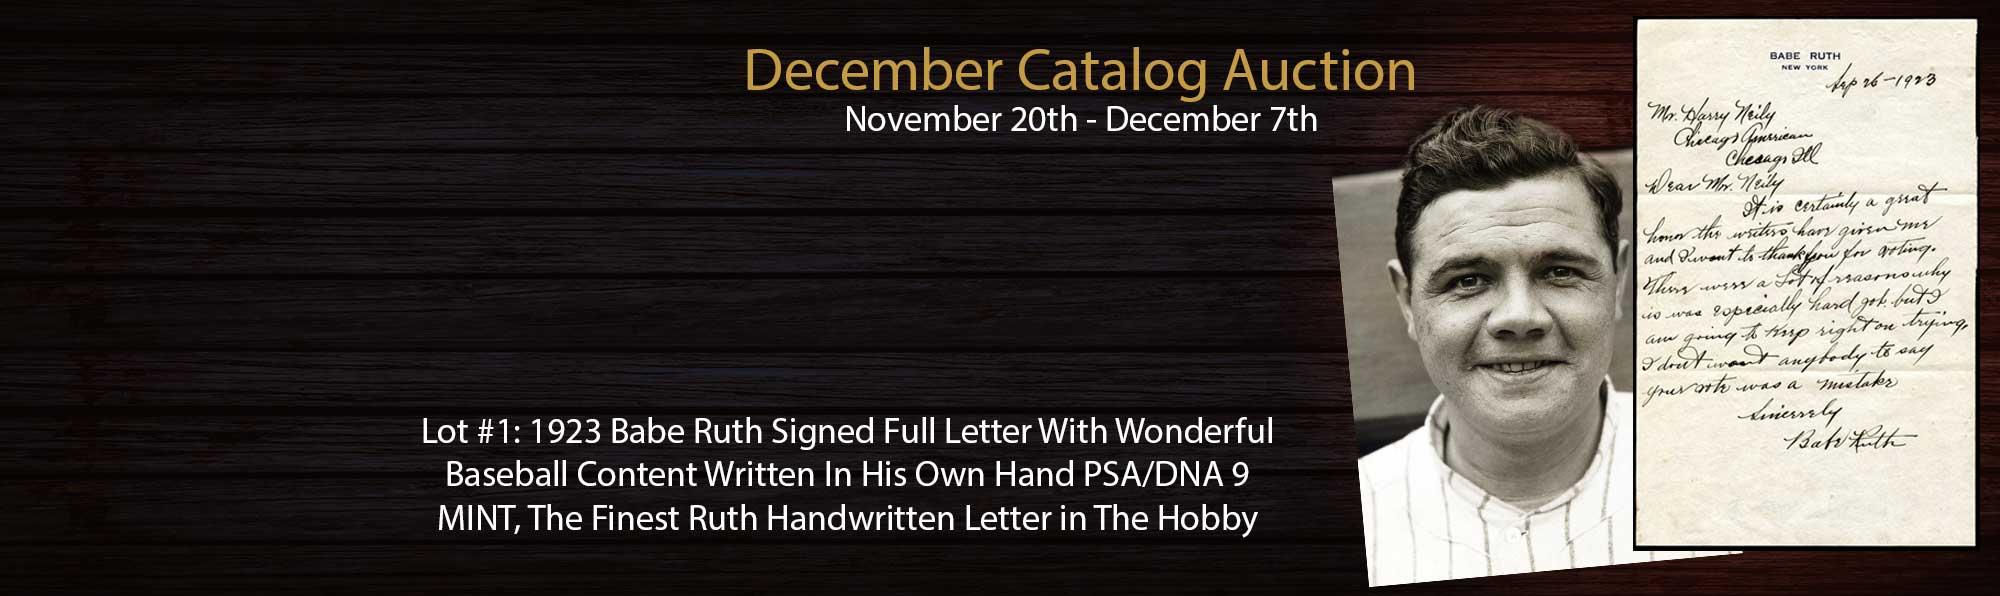 Babe Ruth Handwritten Letter